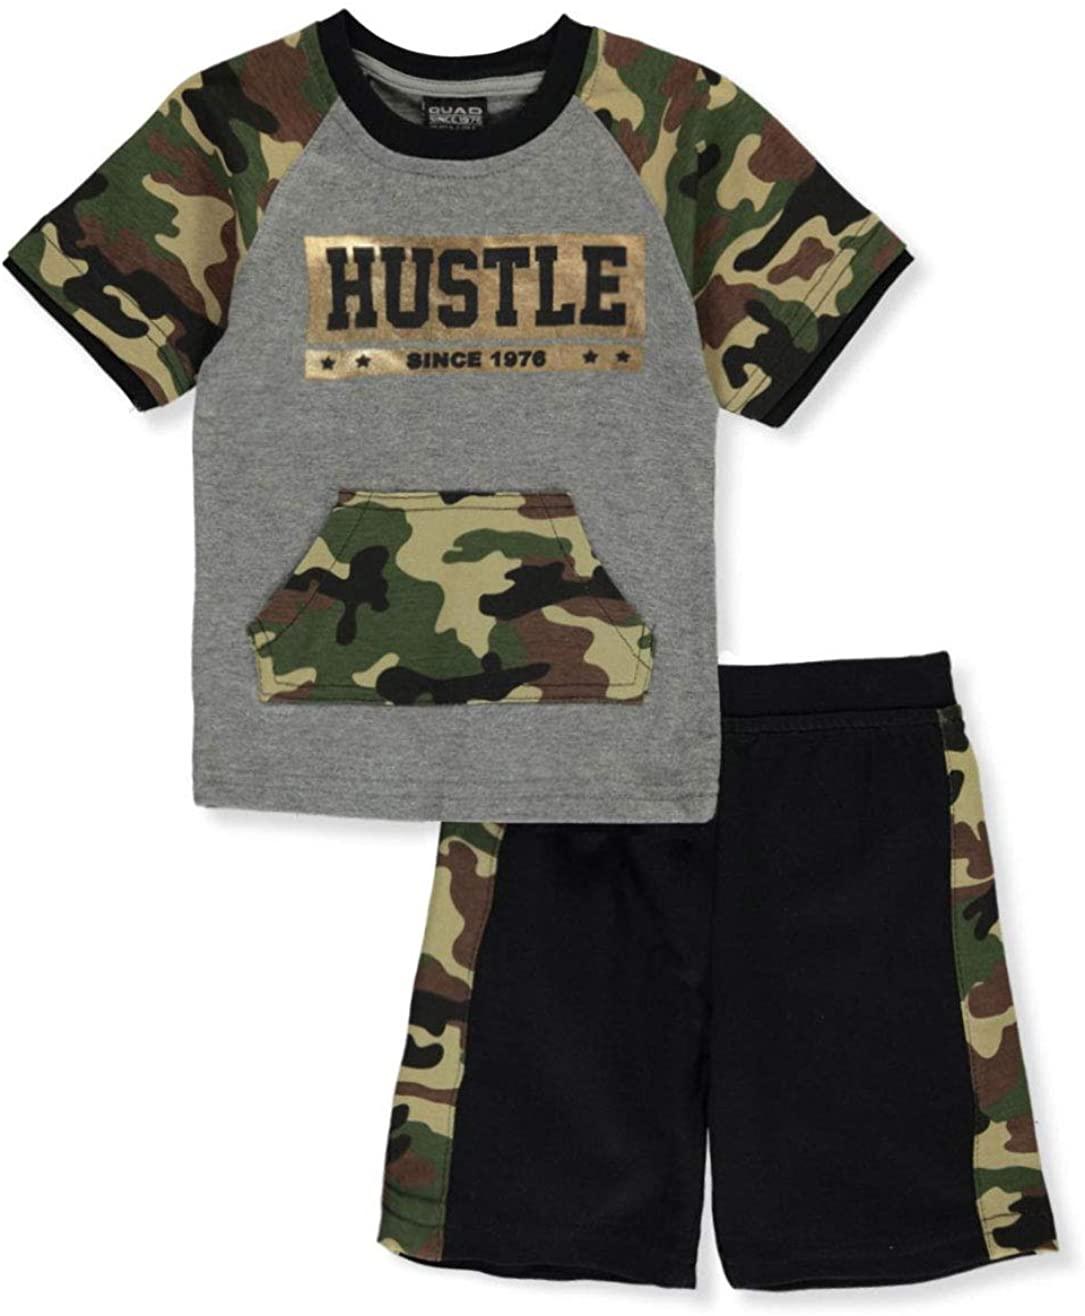 Quad Seven Baby Boys' Hustle Camo 2-Piece Shorts Set Outfit